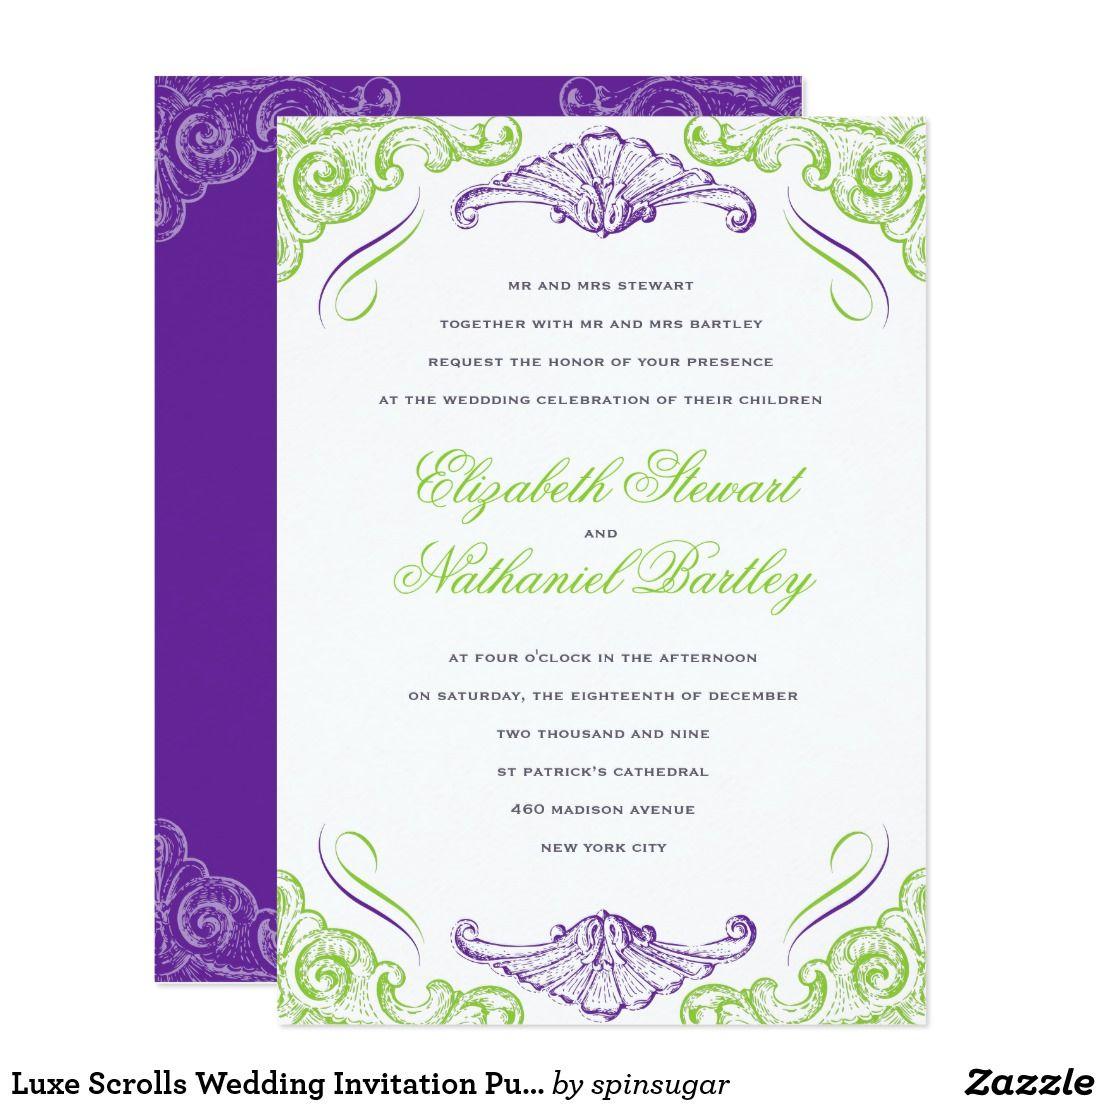 Luxe Scrolls Wedding Invitation Purple Green   Wedding Ideas, Favors ...